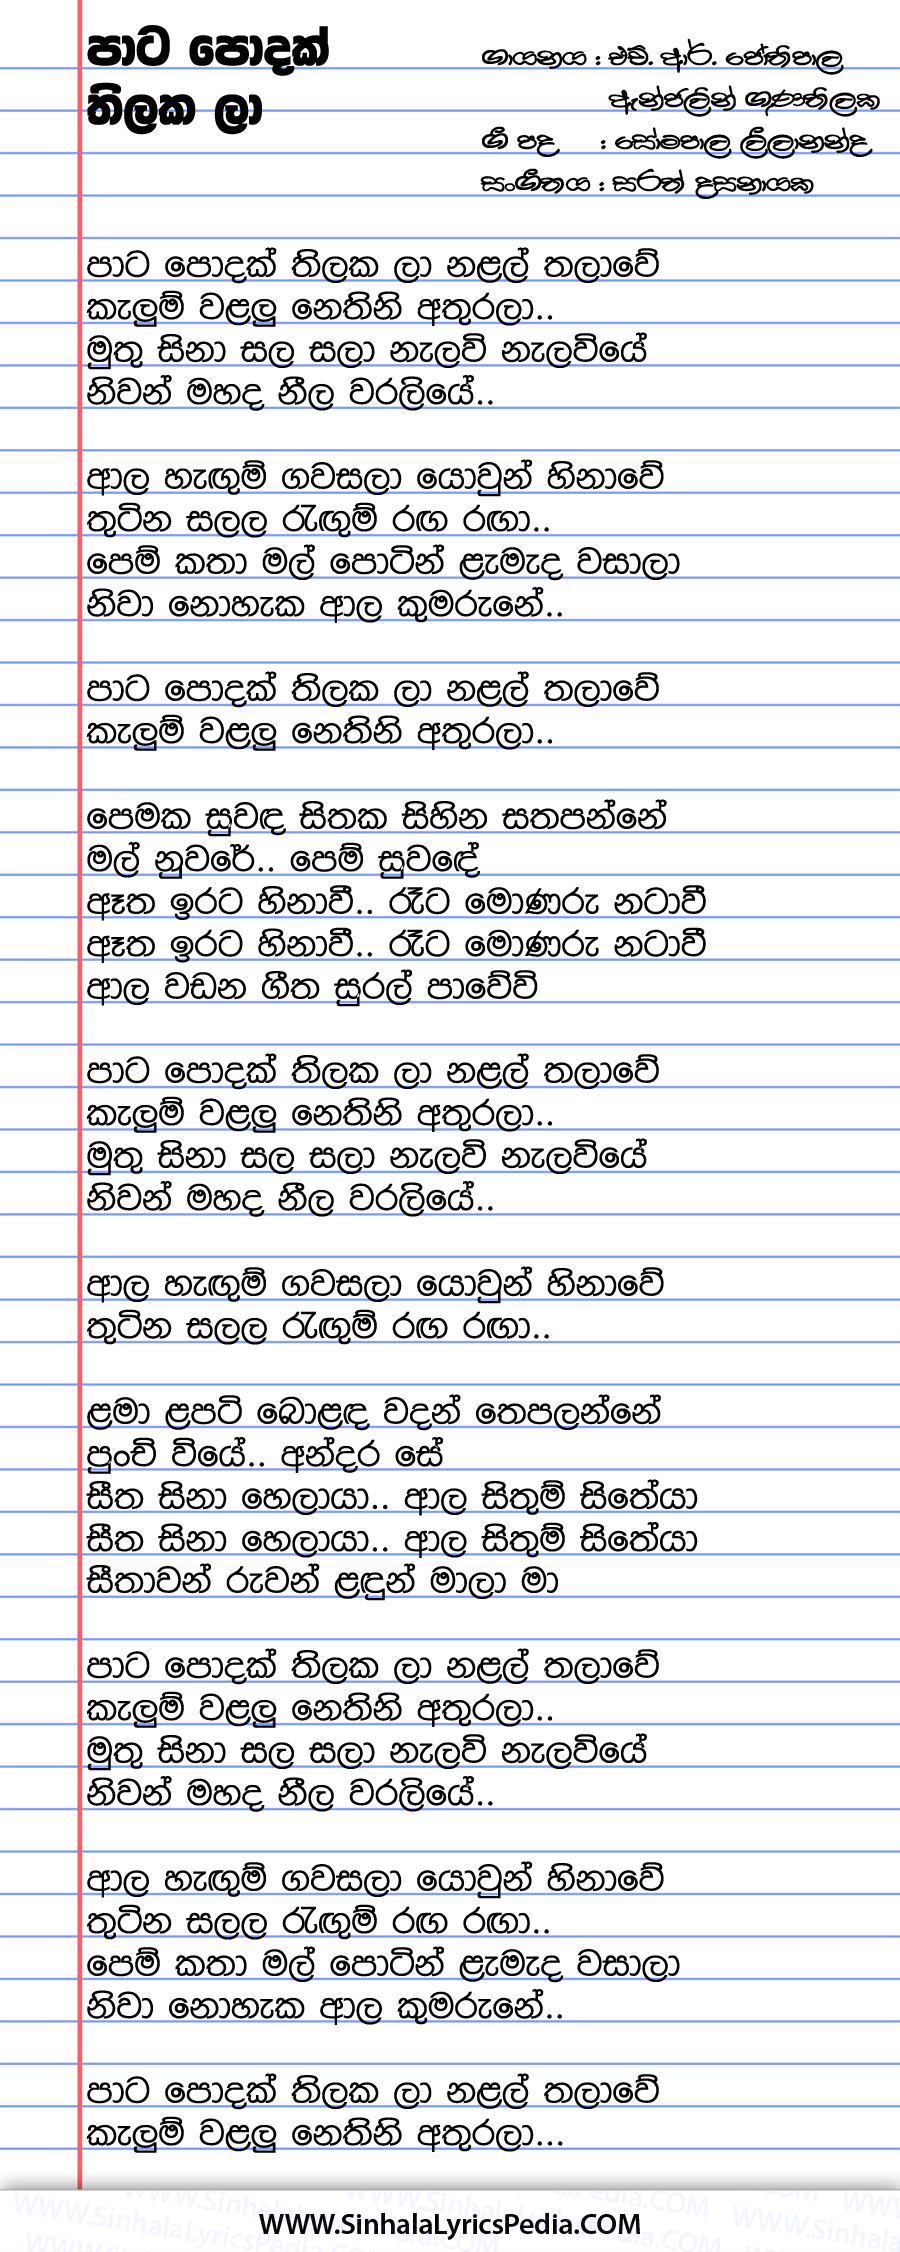 Pata Podak Thilakala Nalal Thalawe Song Lyrics